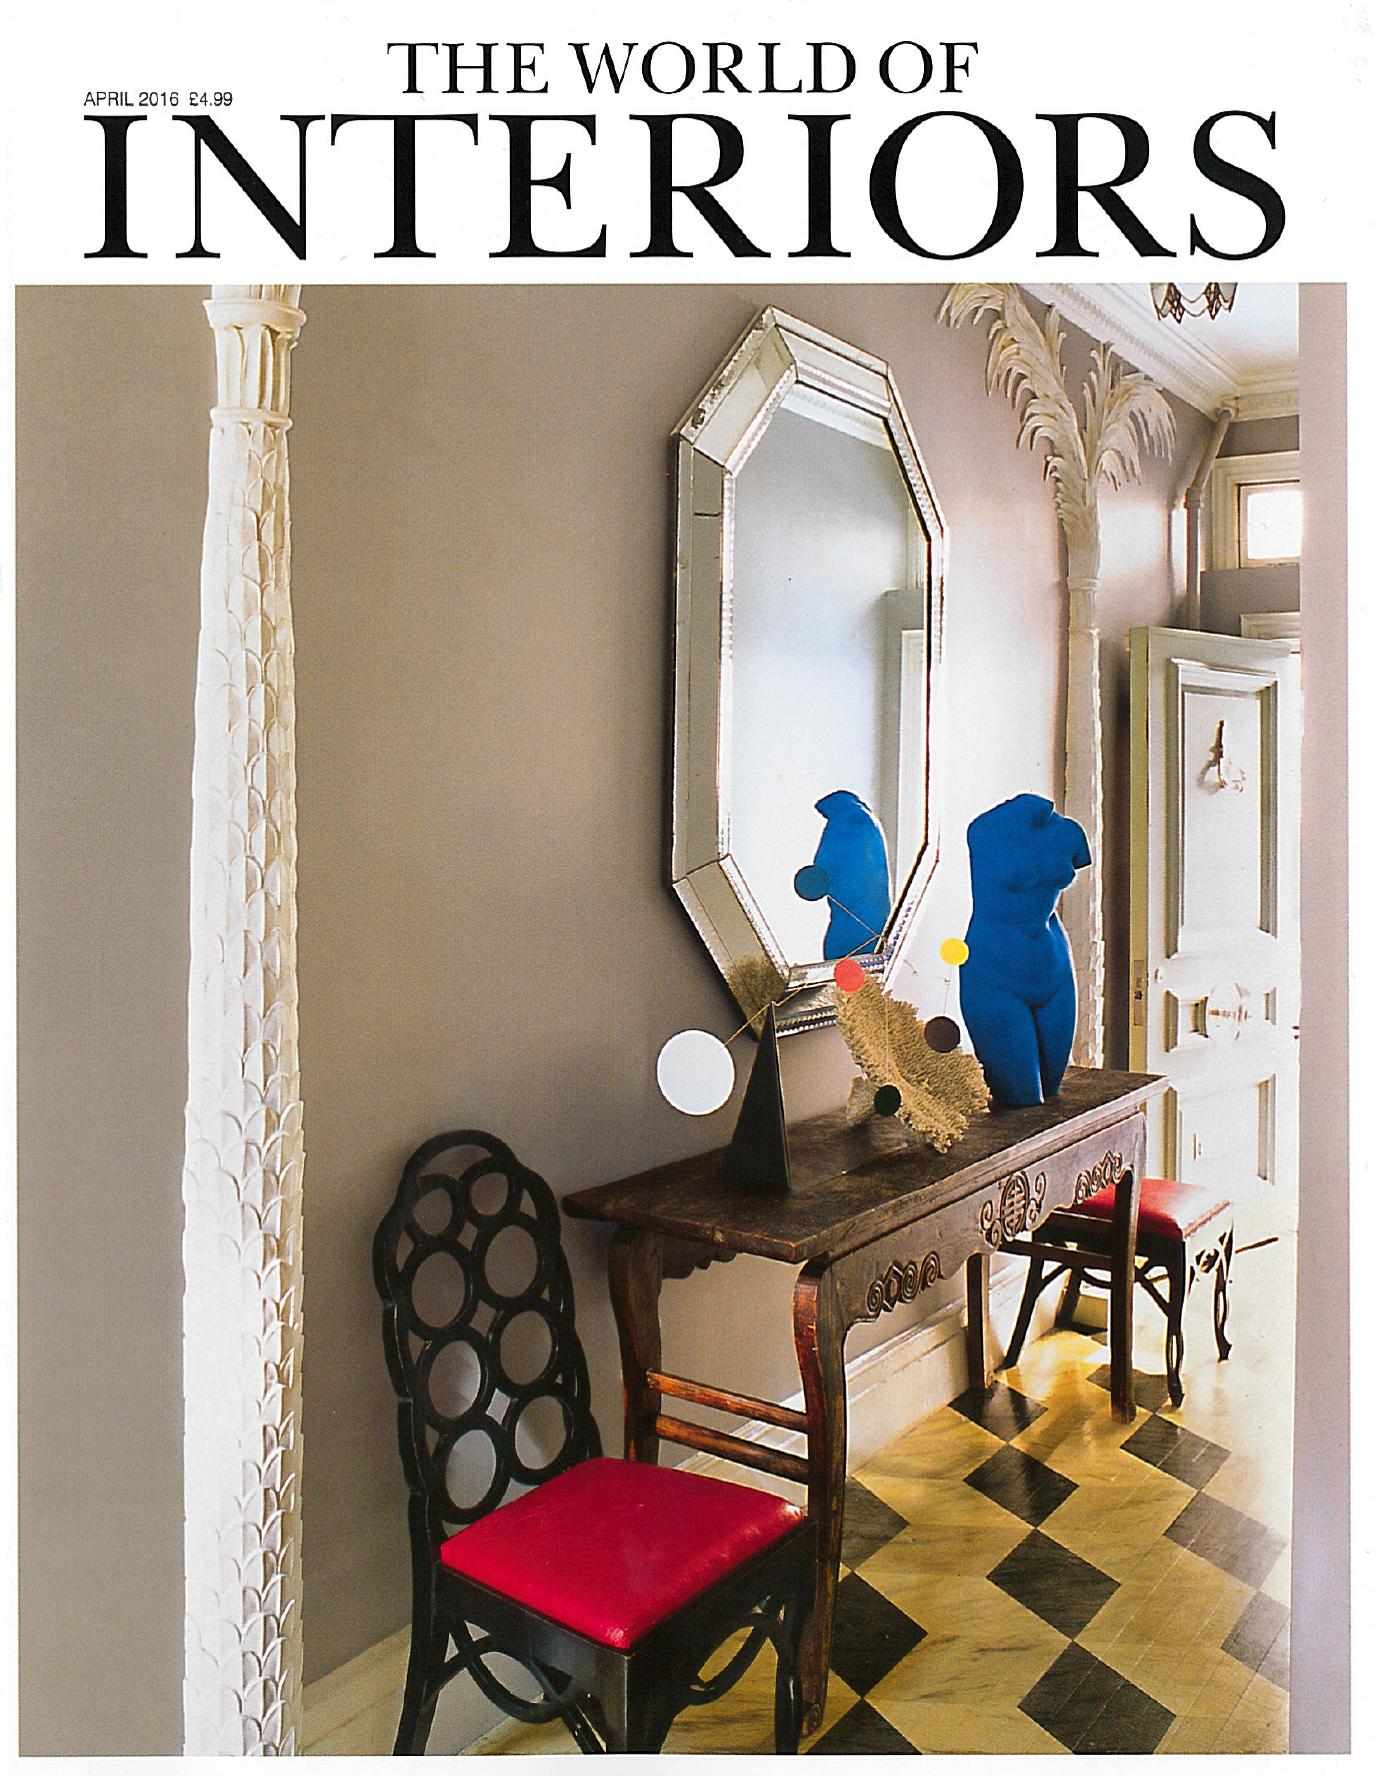 World of Interiors April 16